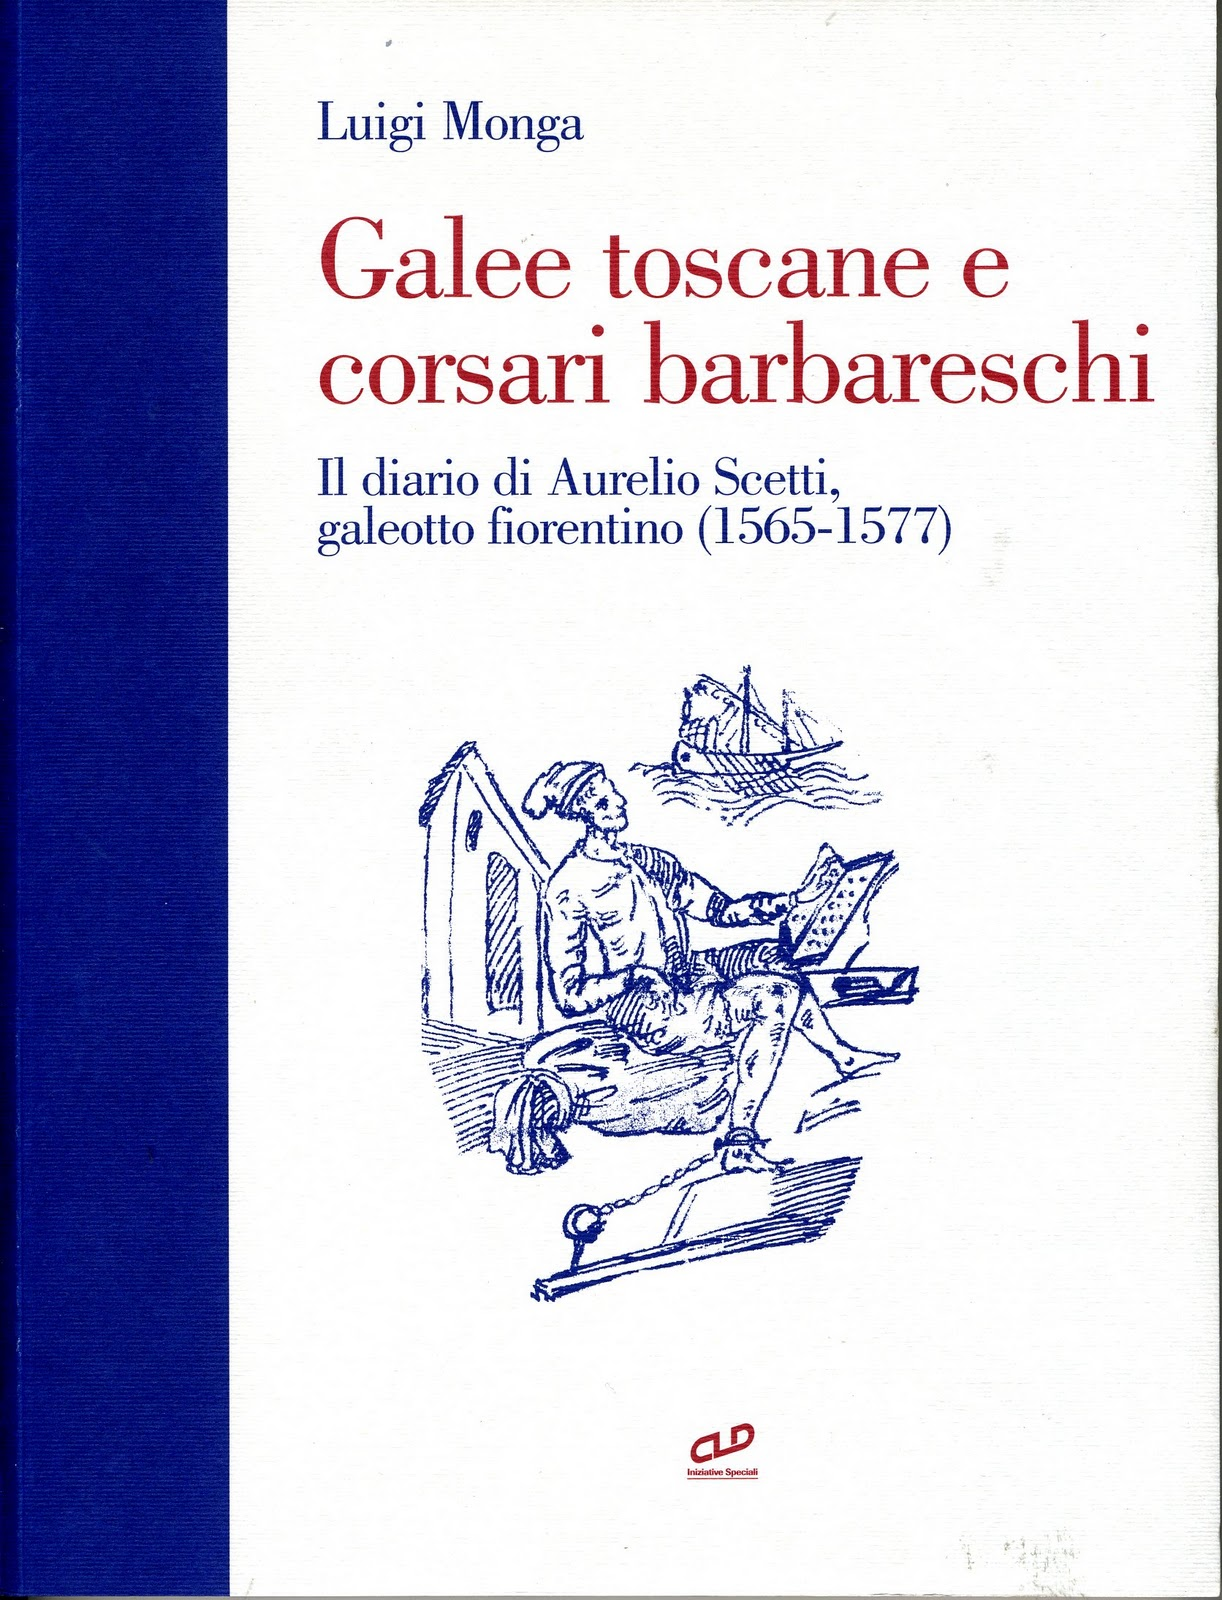 Galee toscane e corsari barbareschi